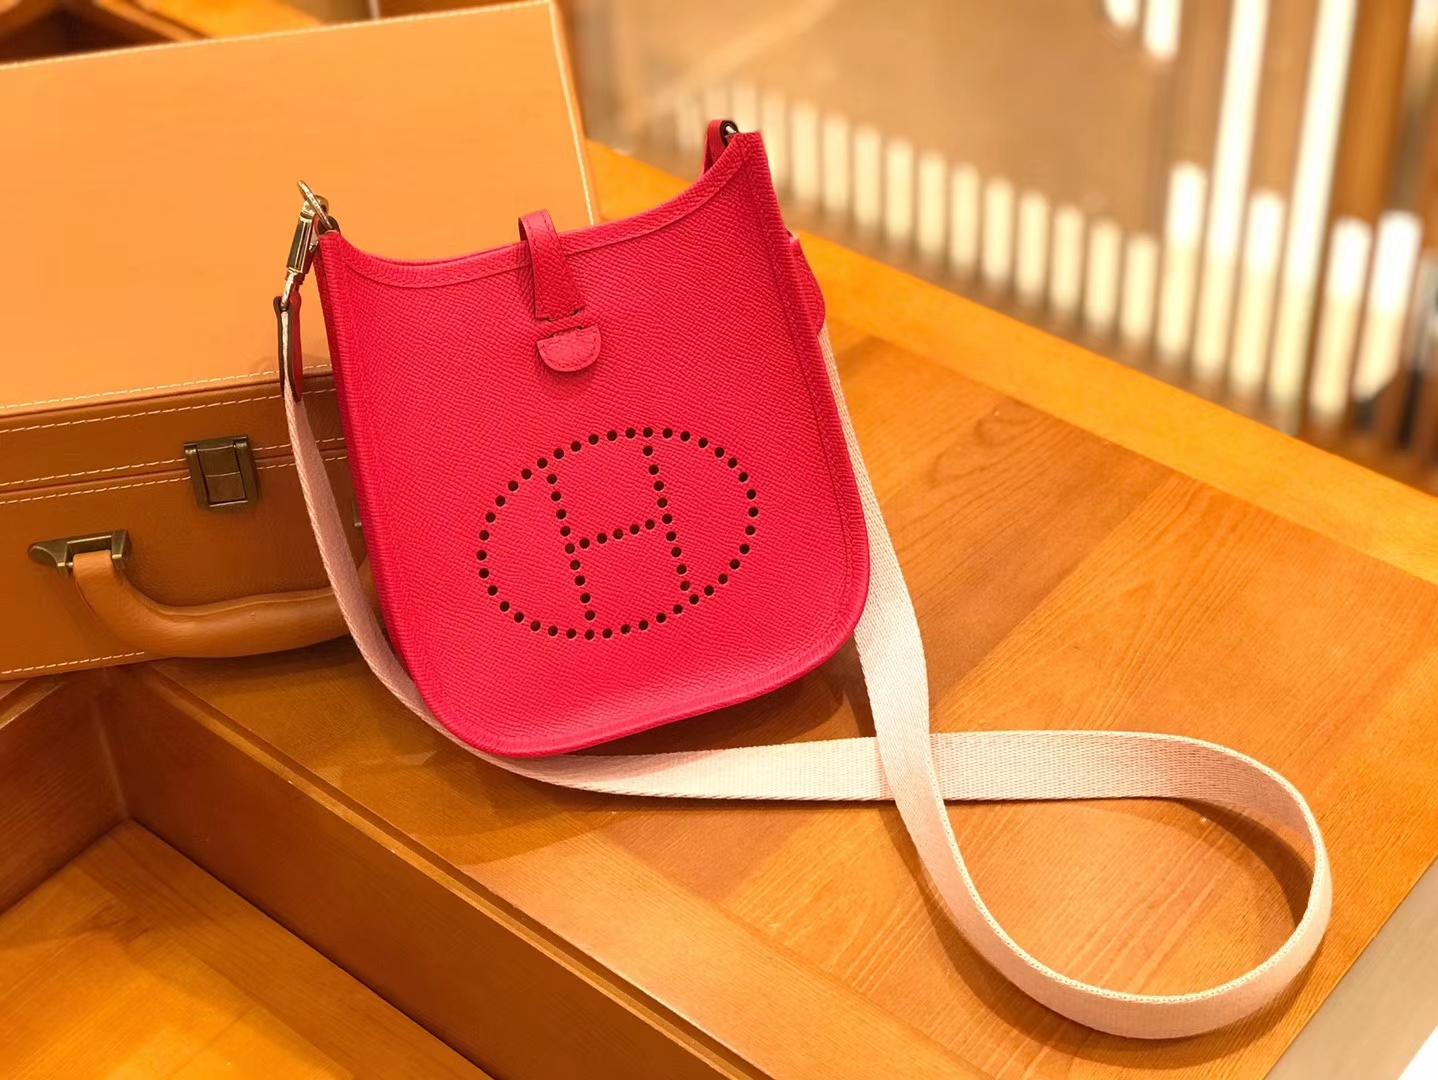 Hermès(爱马仕)Evelyne 伊芙琳 17cm 掌纹牛皮 极致粉